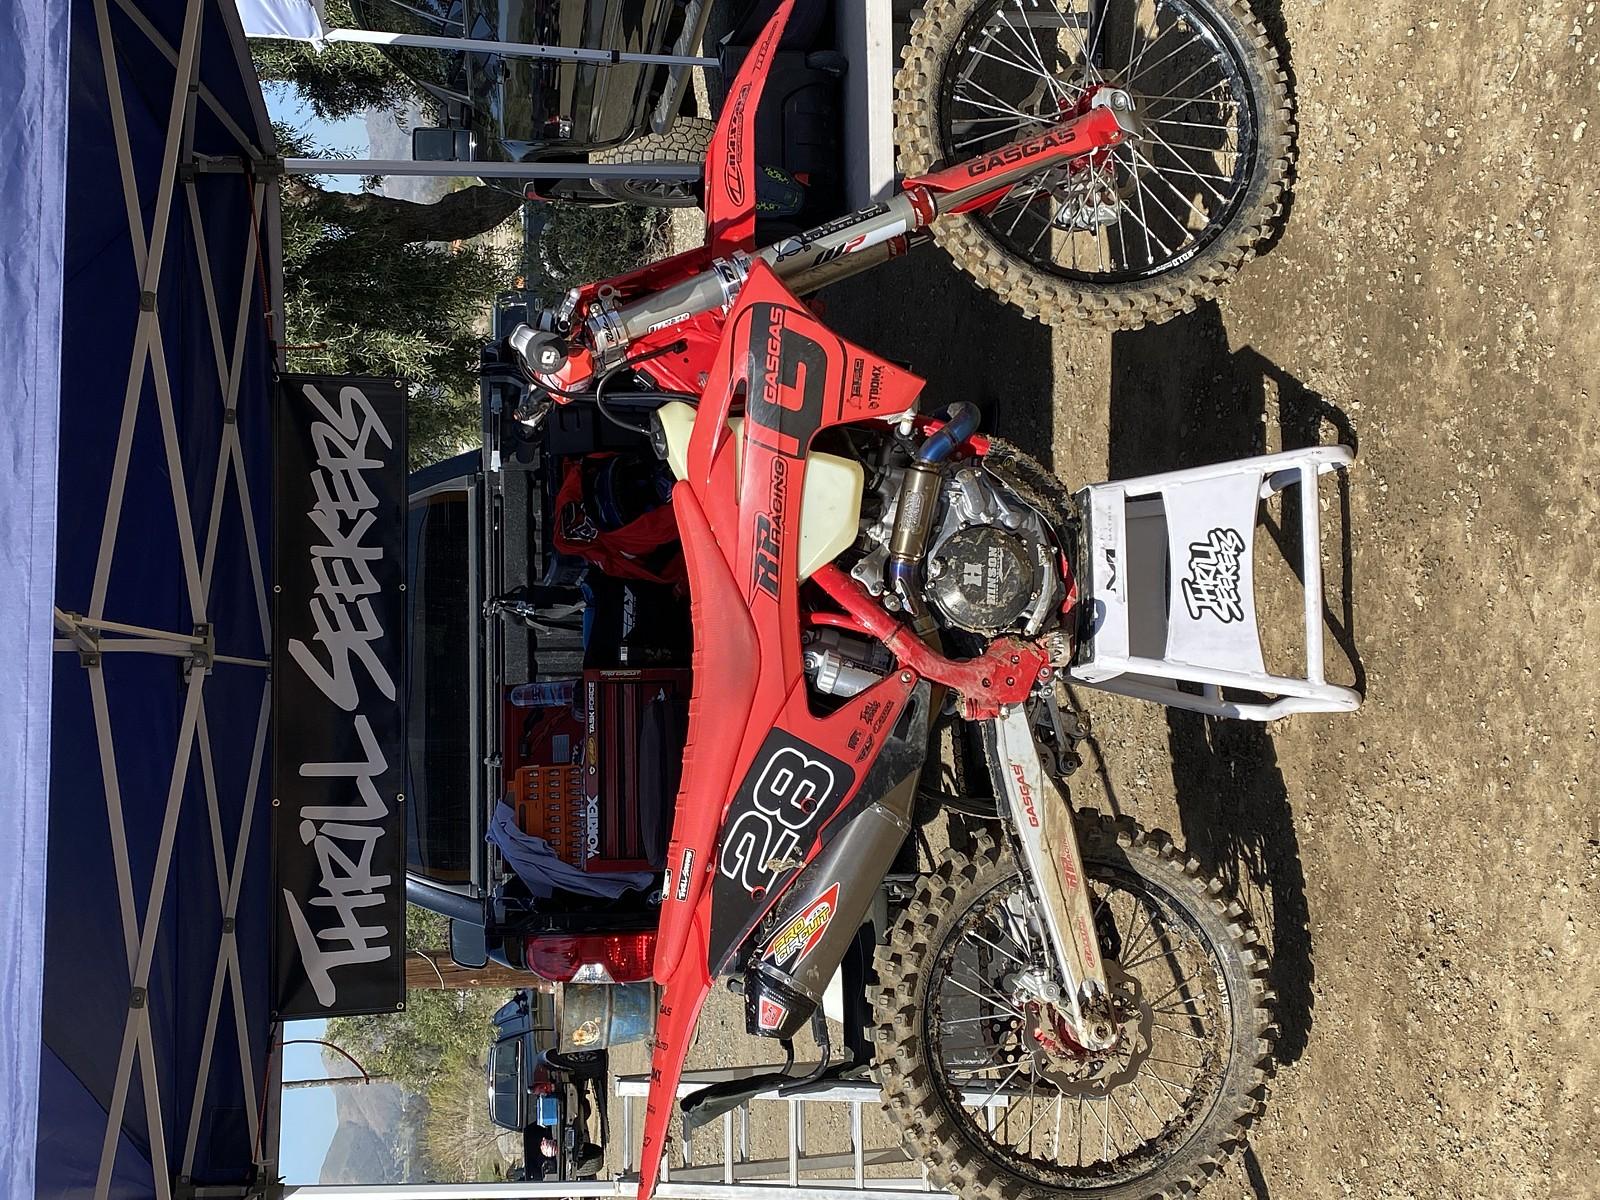 Perris Ride Day - prida28 - Motocross Pictures - Vital MX